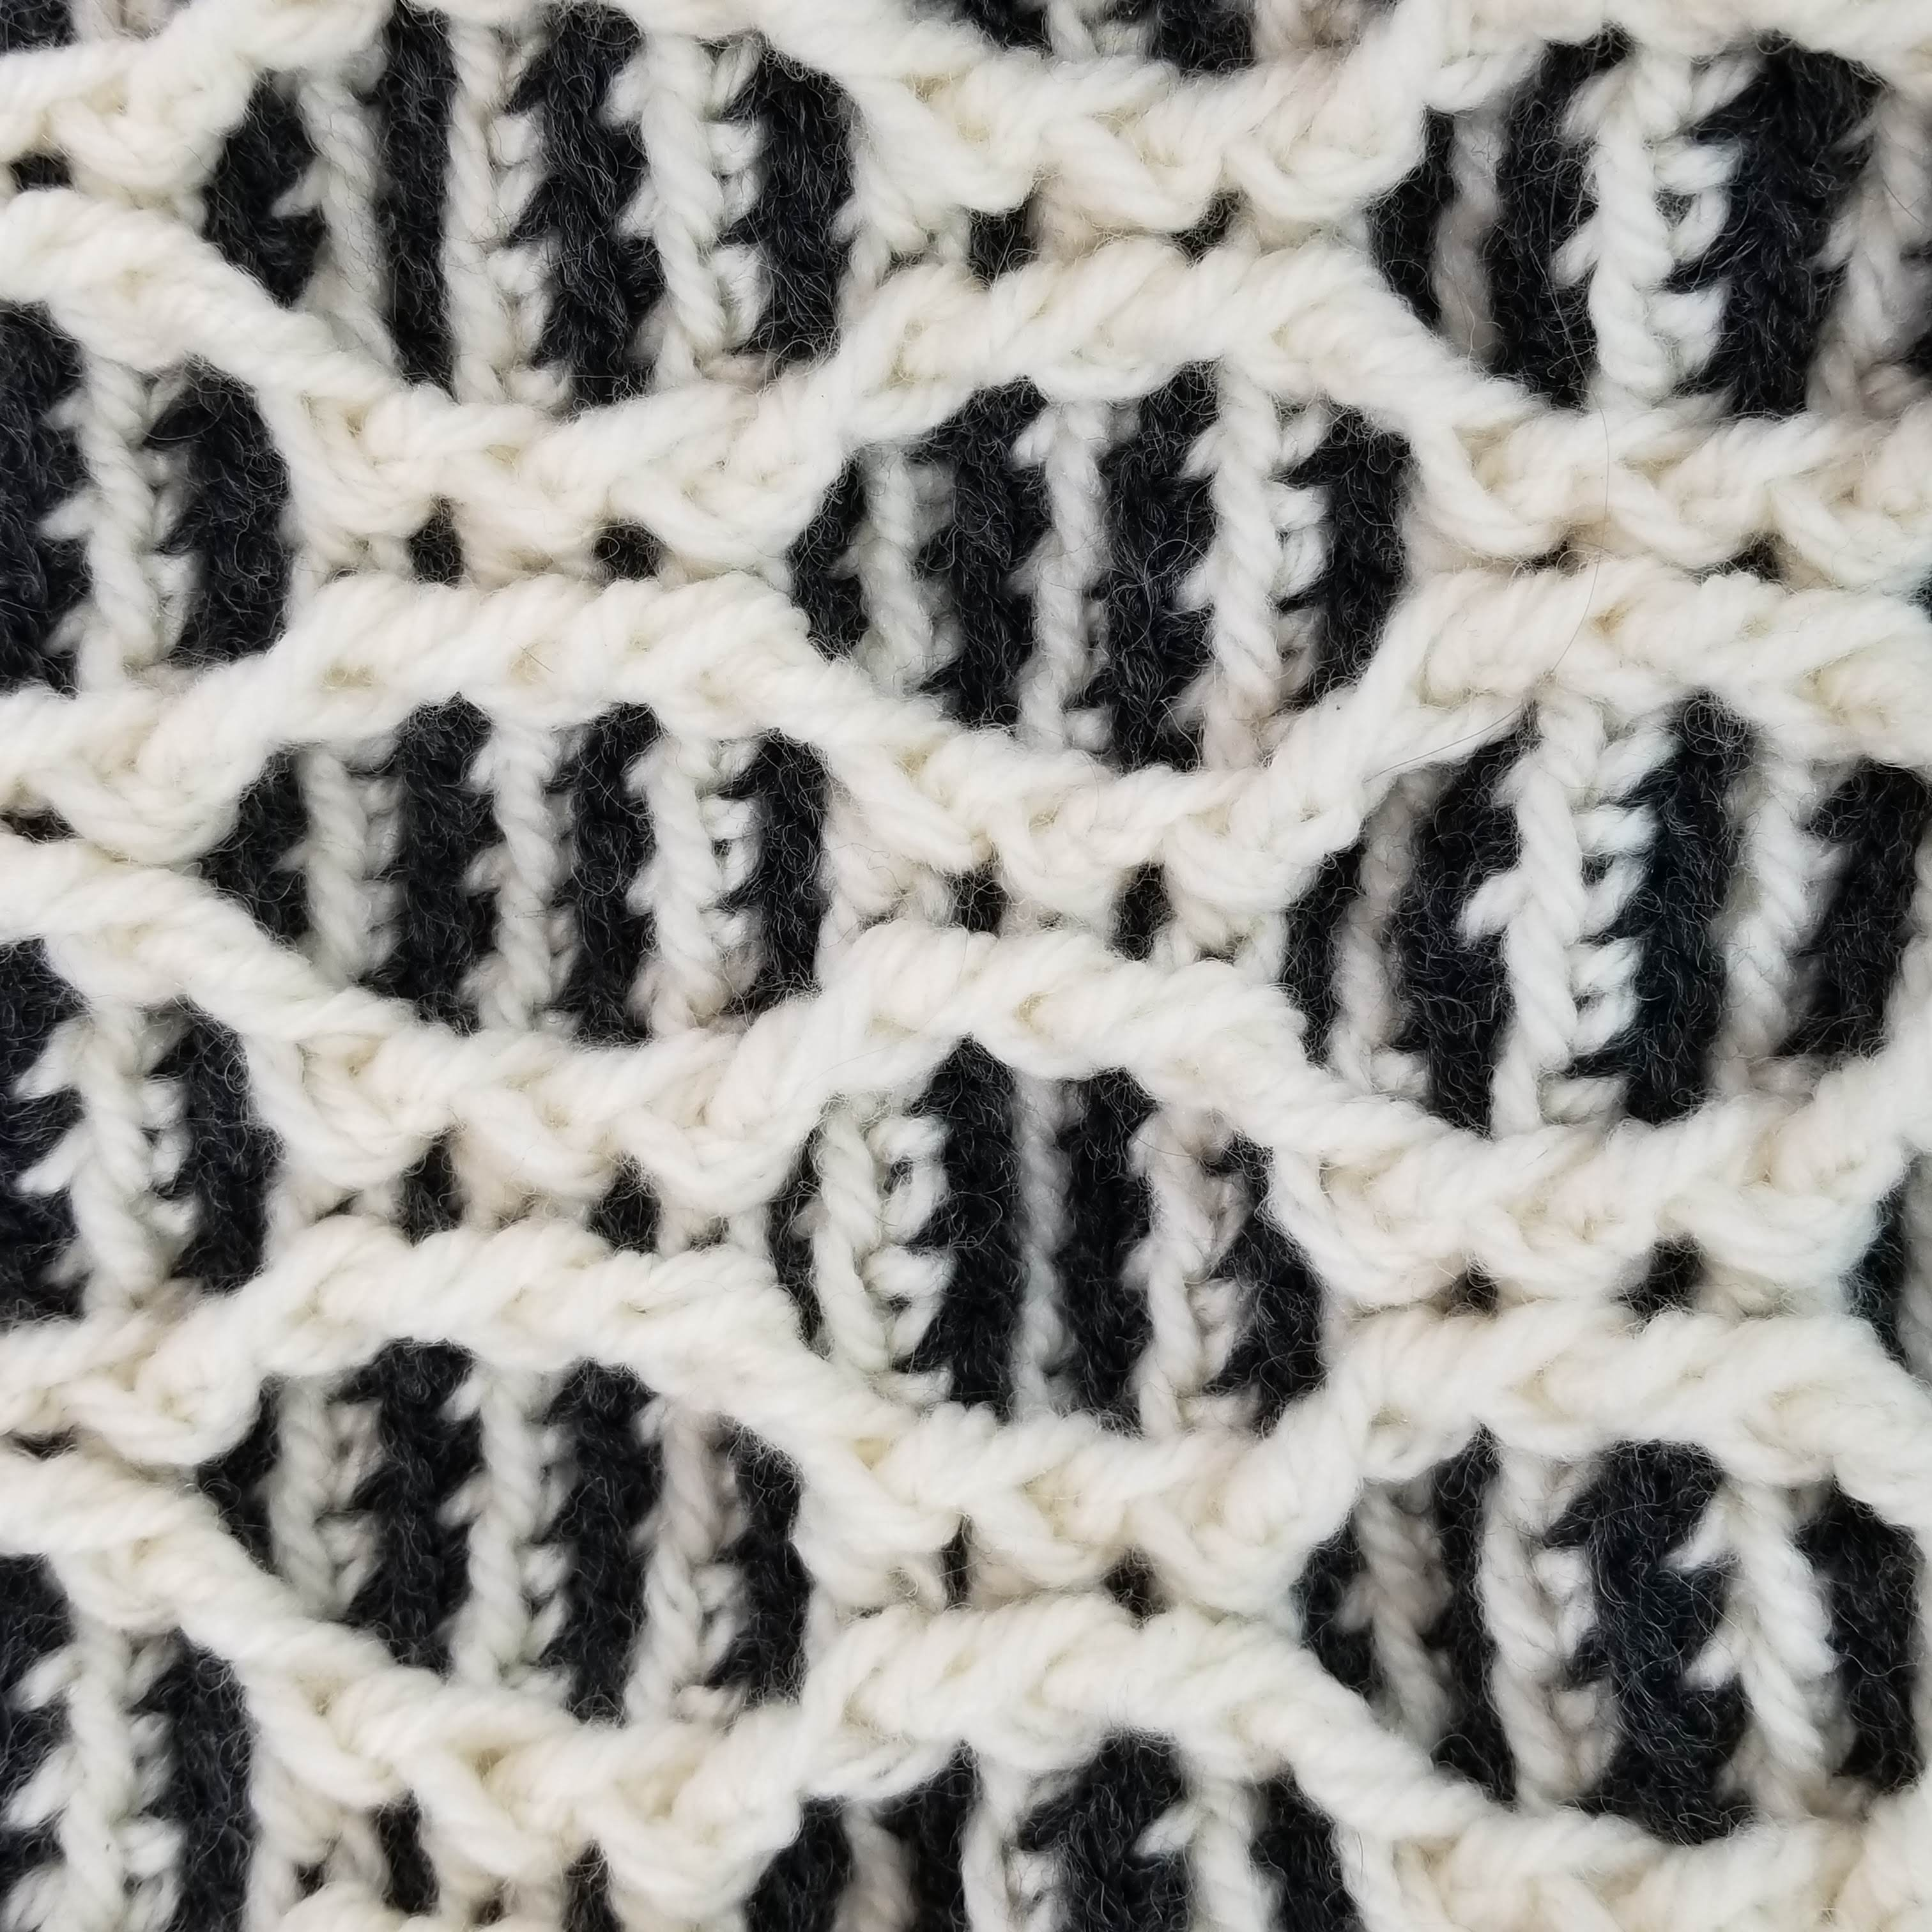 Patons Striped Hourglass Basket (close up shot)